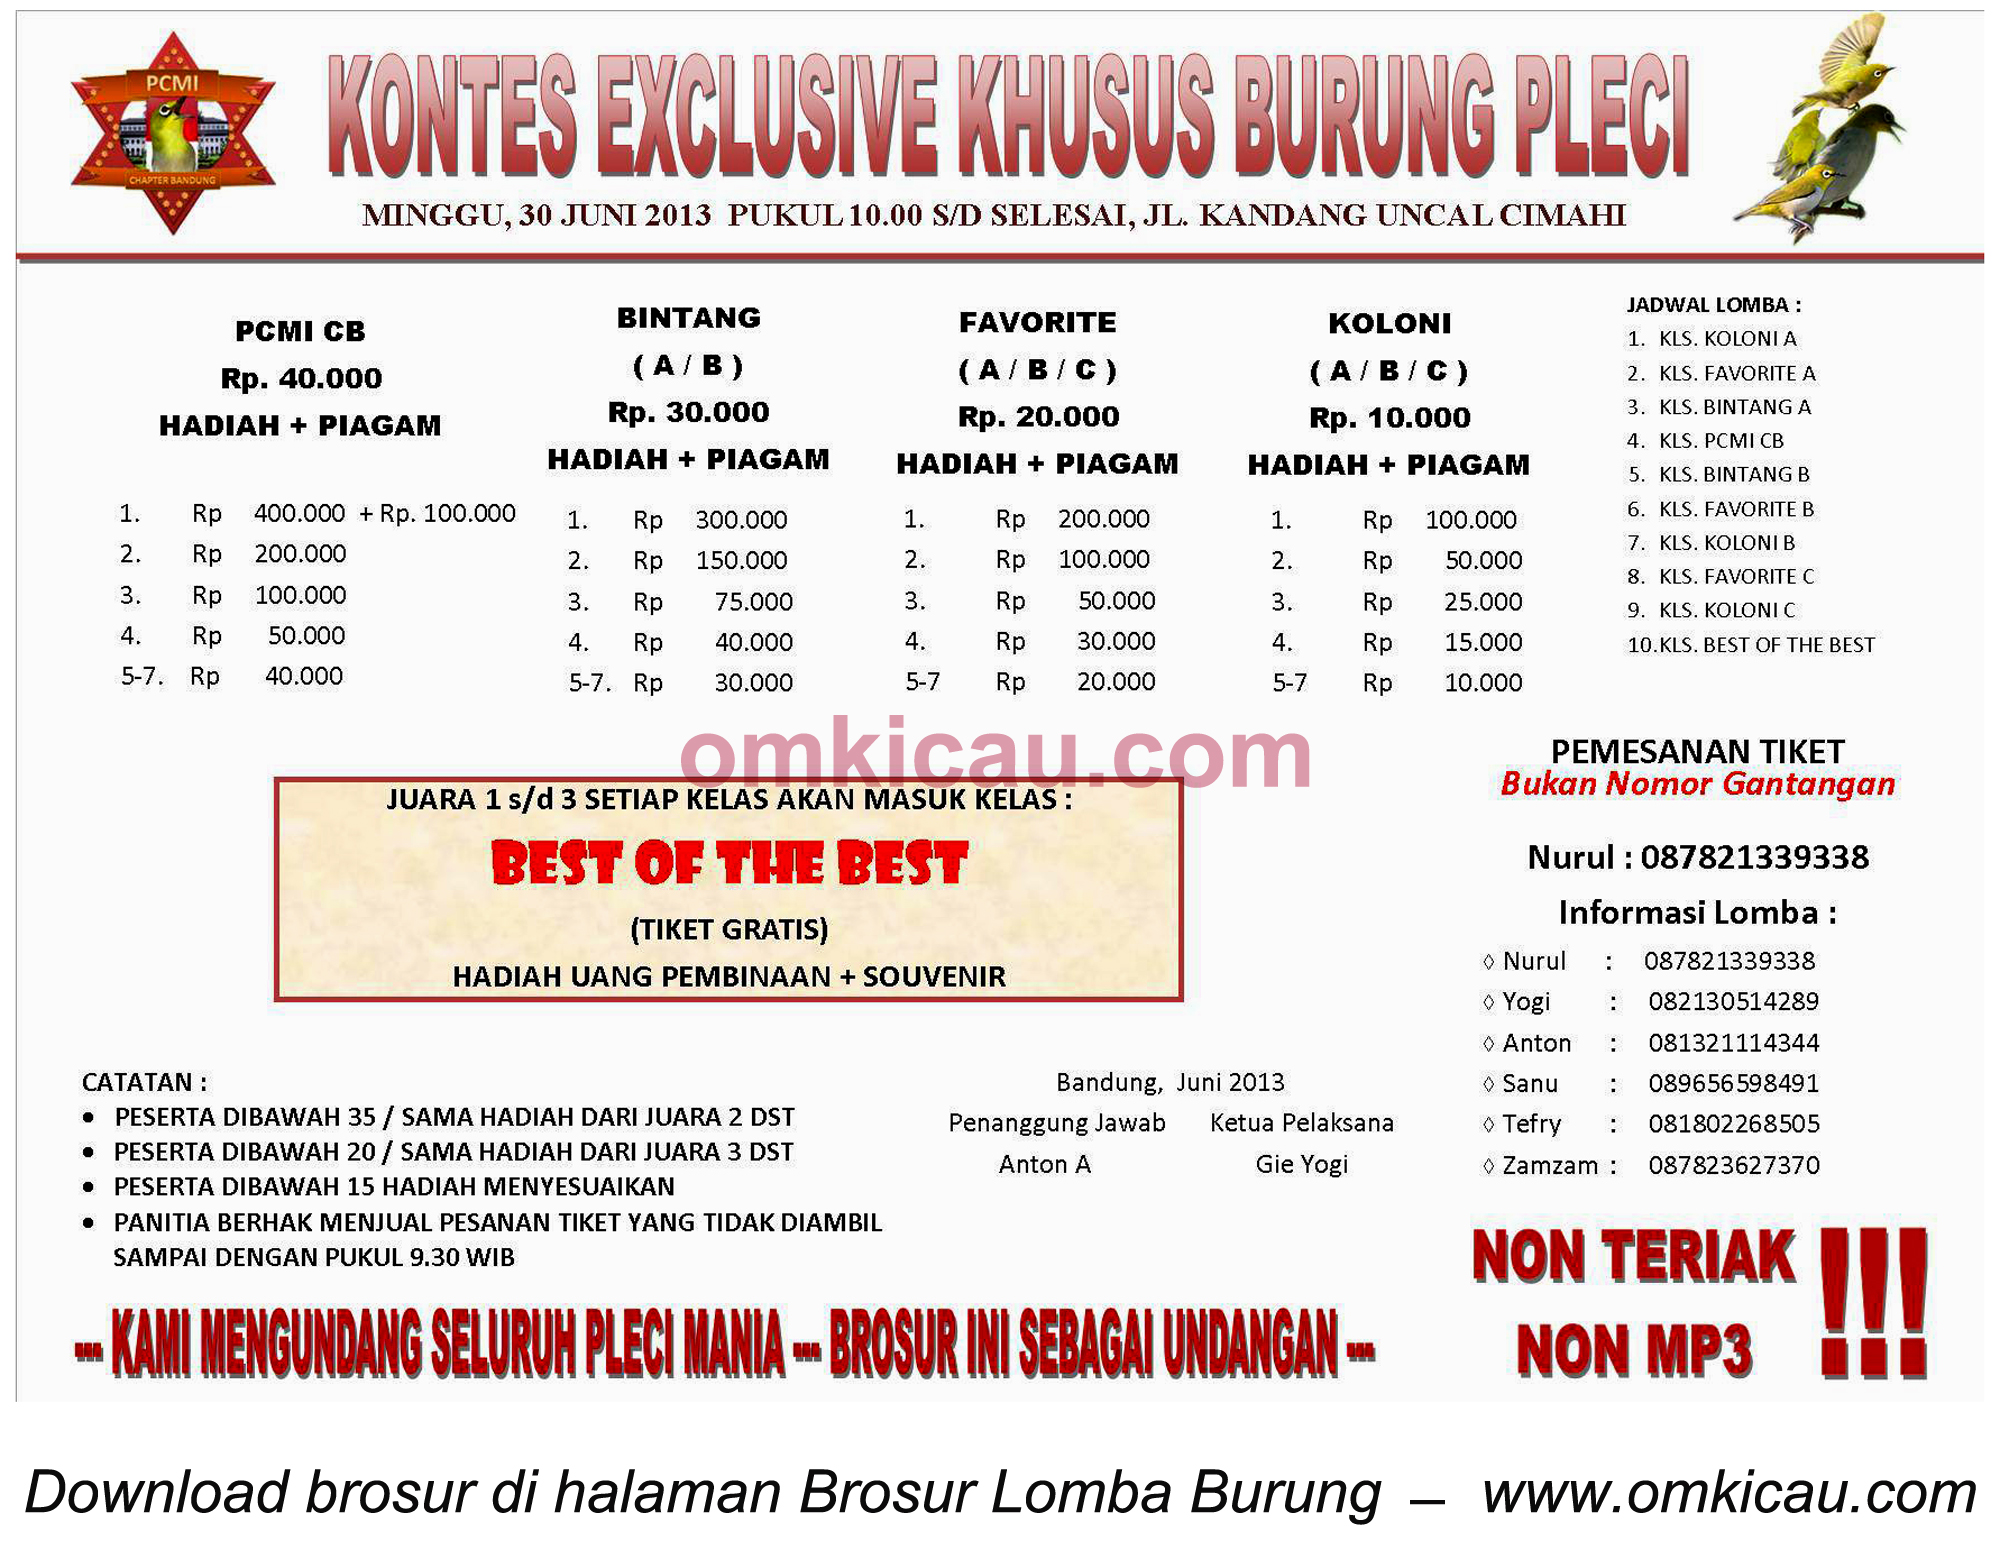 Brosur Kontes Exclusive Burung Pleci, Cimahi, 30 Juni 2013